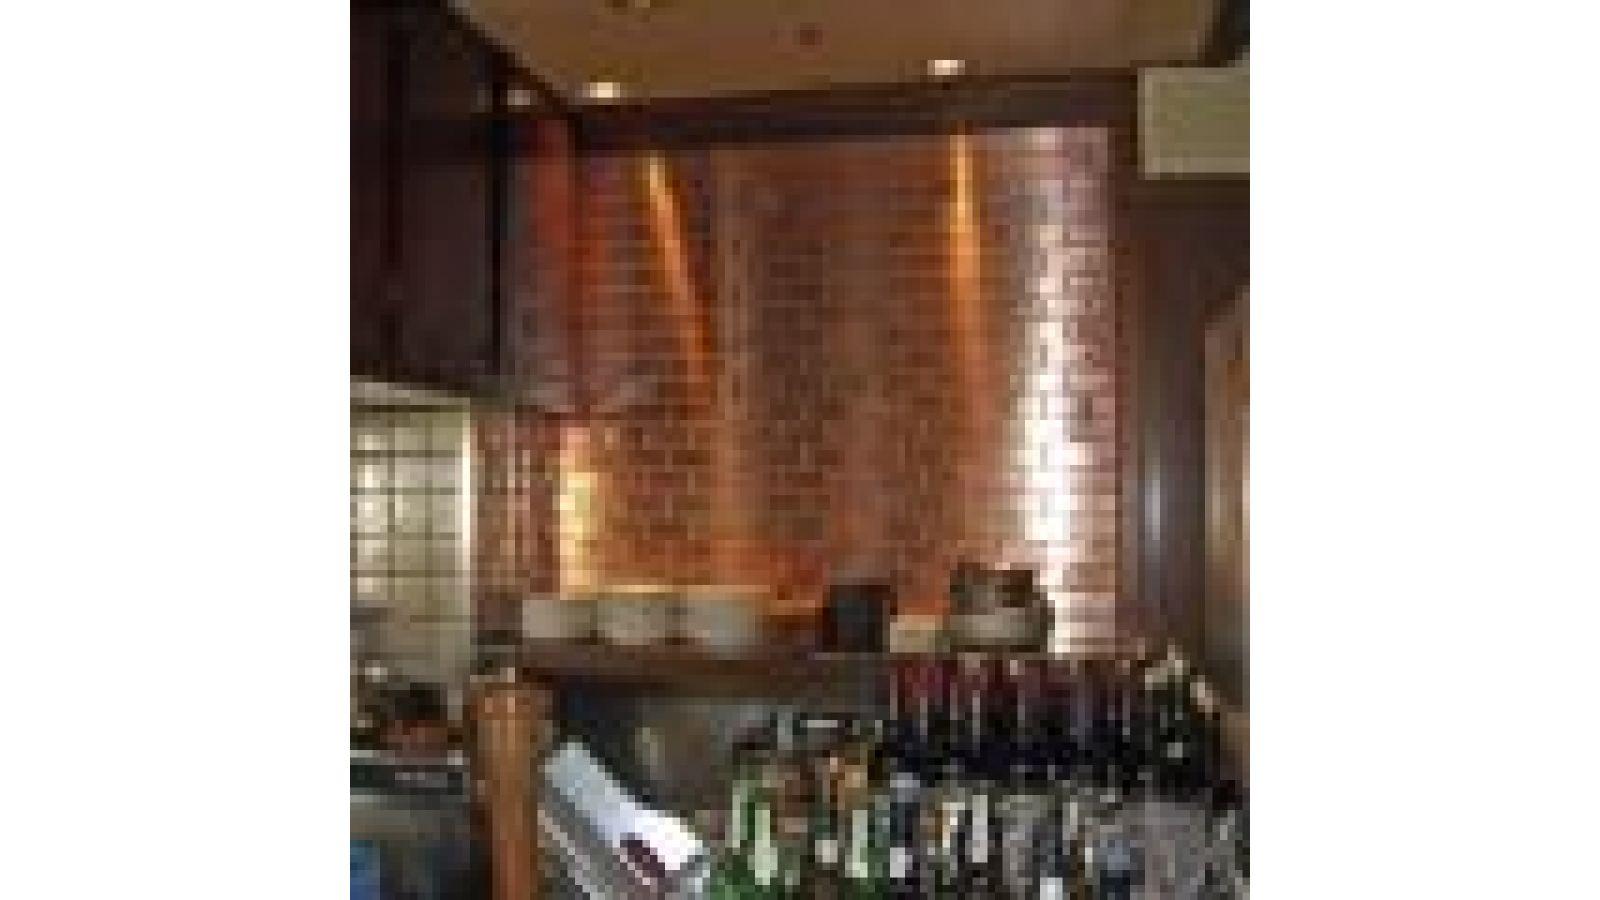 Subway Tiles - Stainless Steel, Copper & Titanium